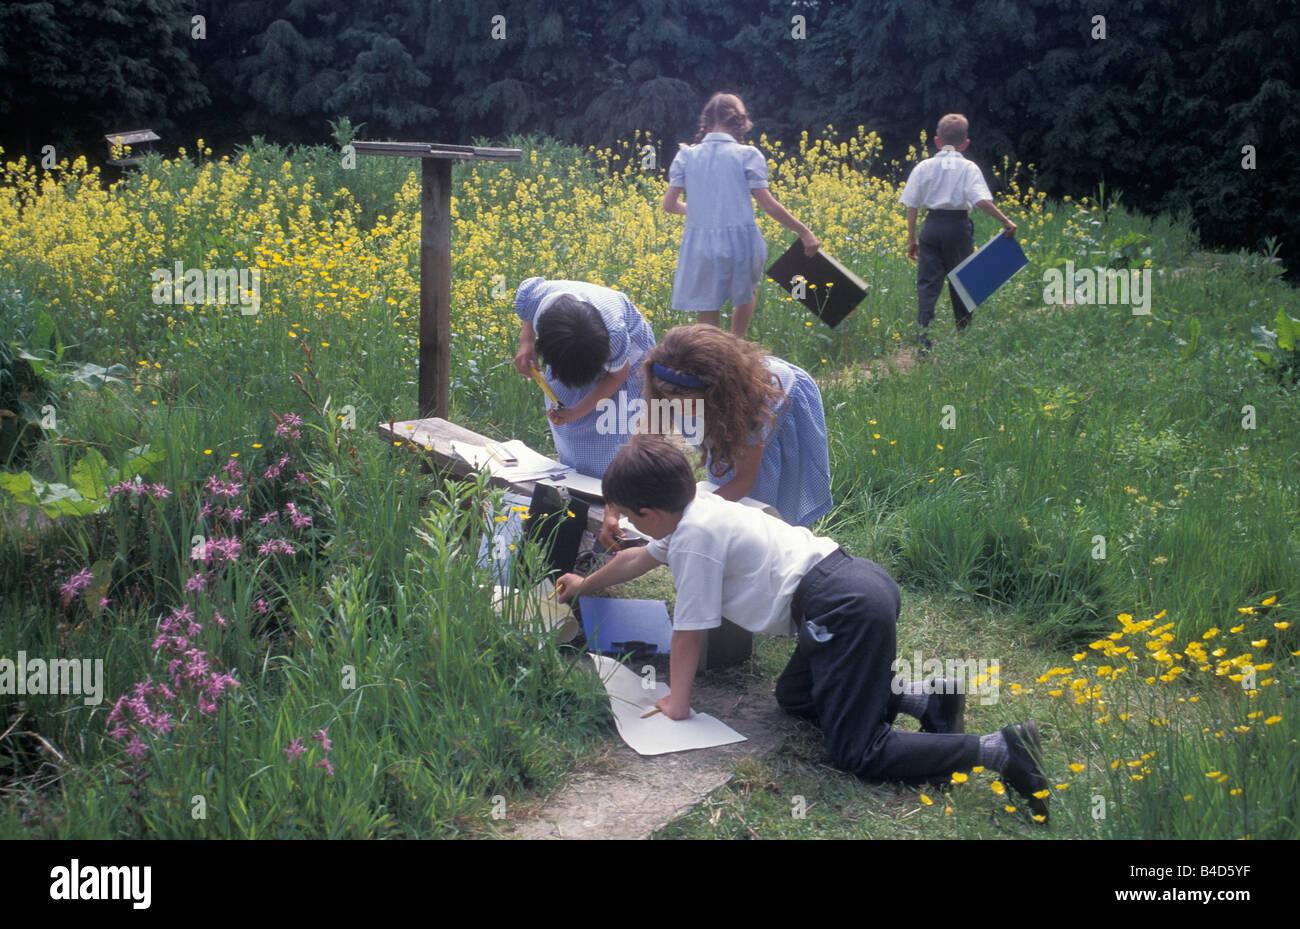 primary school kids on nature study field trip - Stock Image